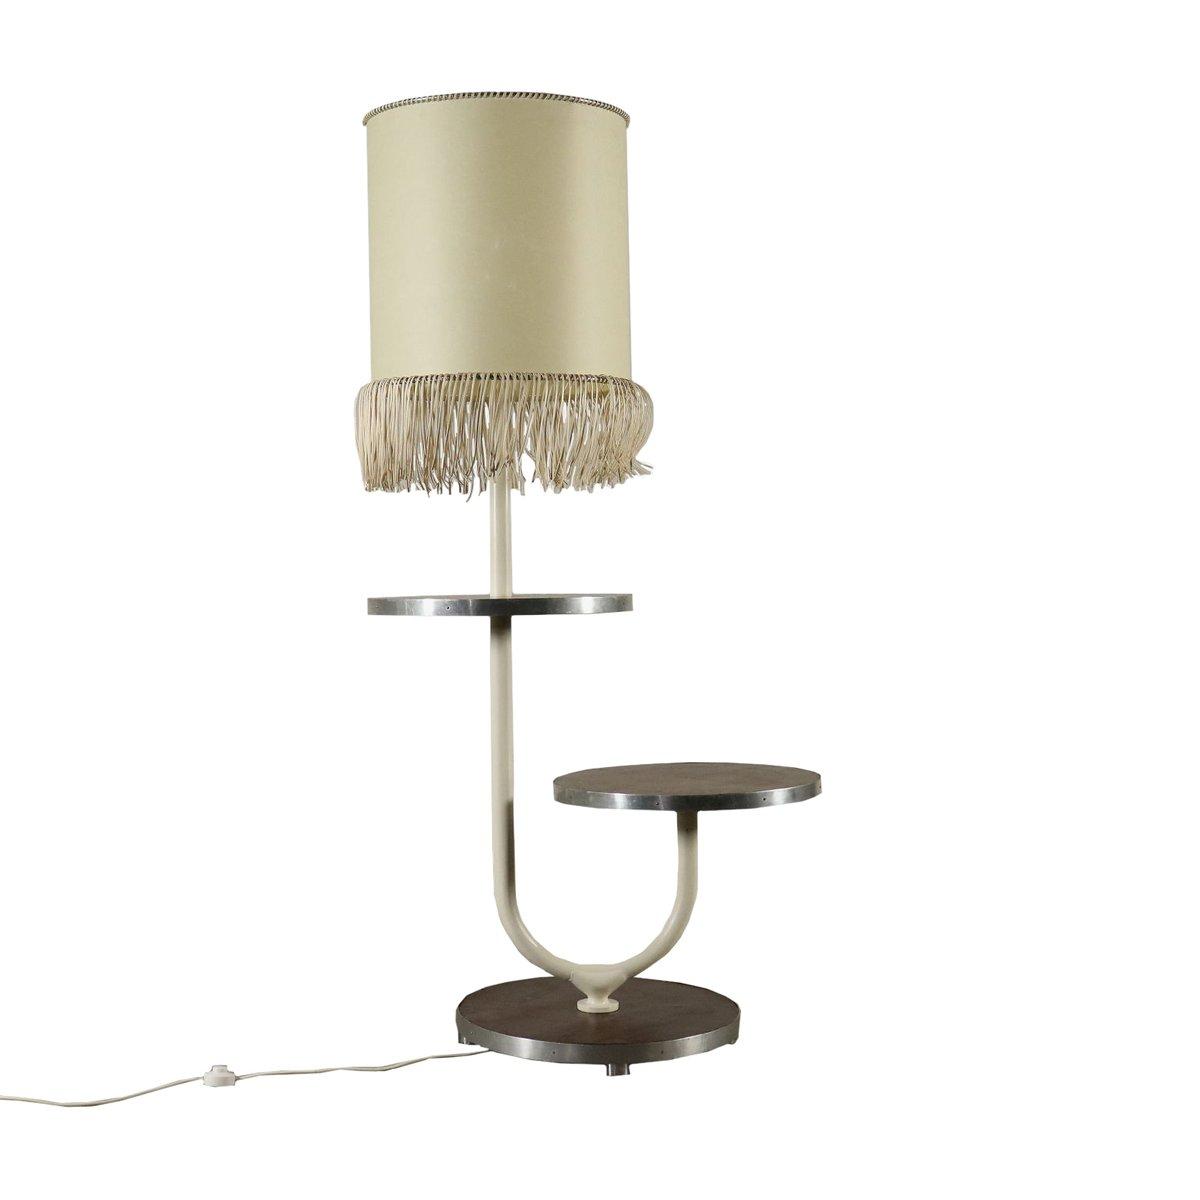 Vintage Italian Floor Lamp with Circular Table, 1970s